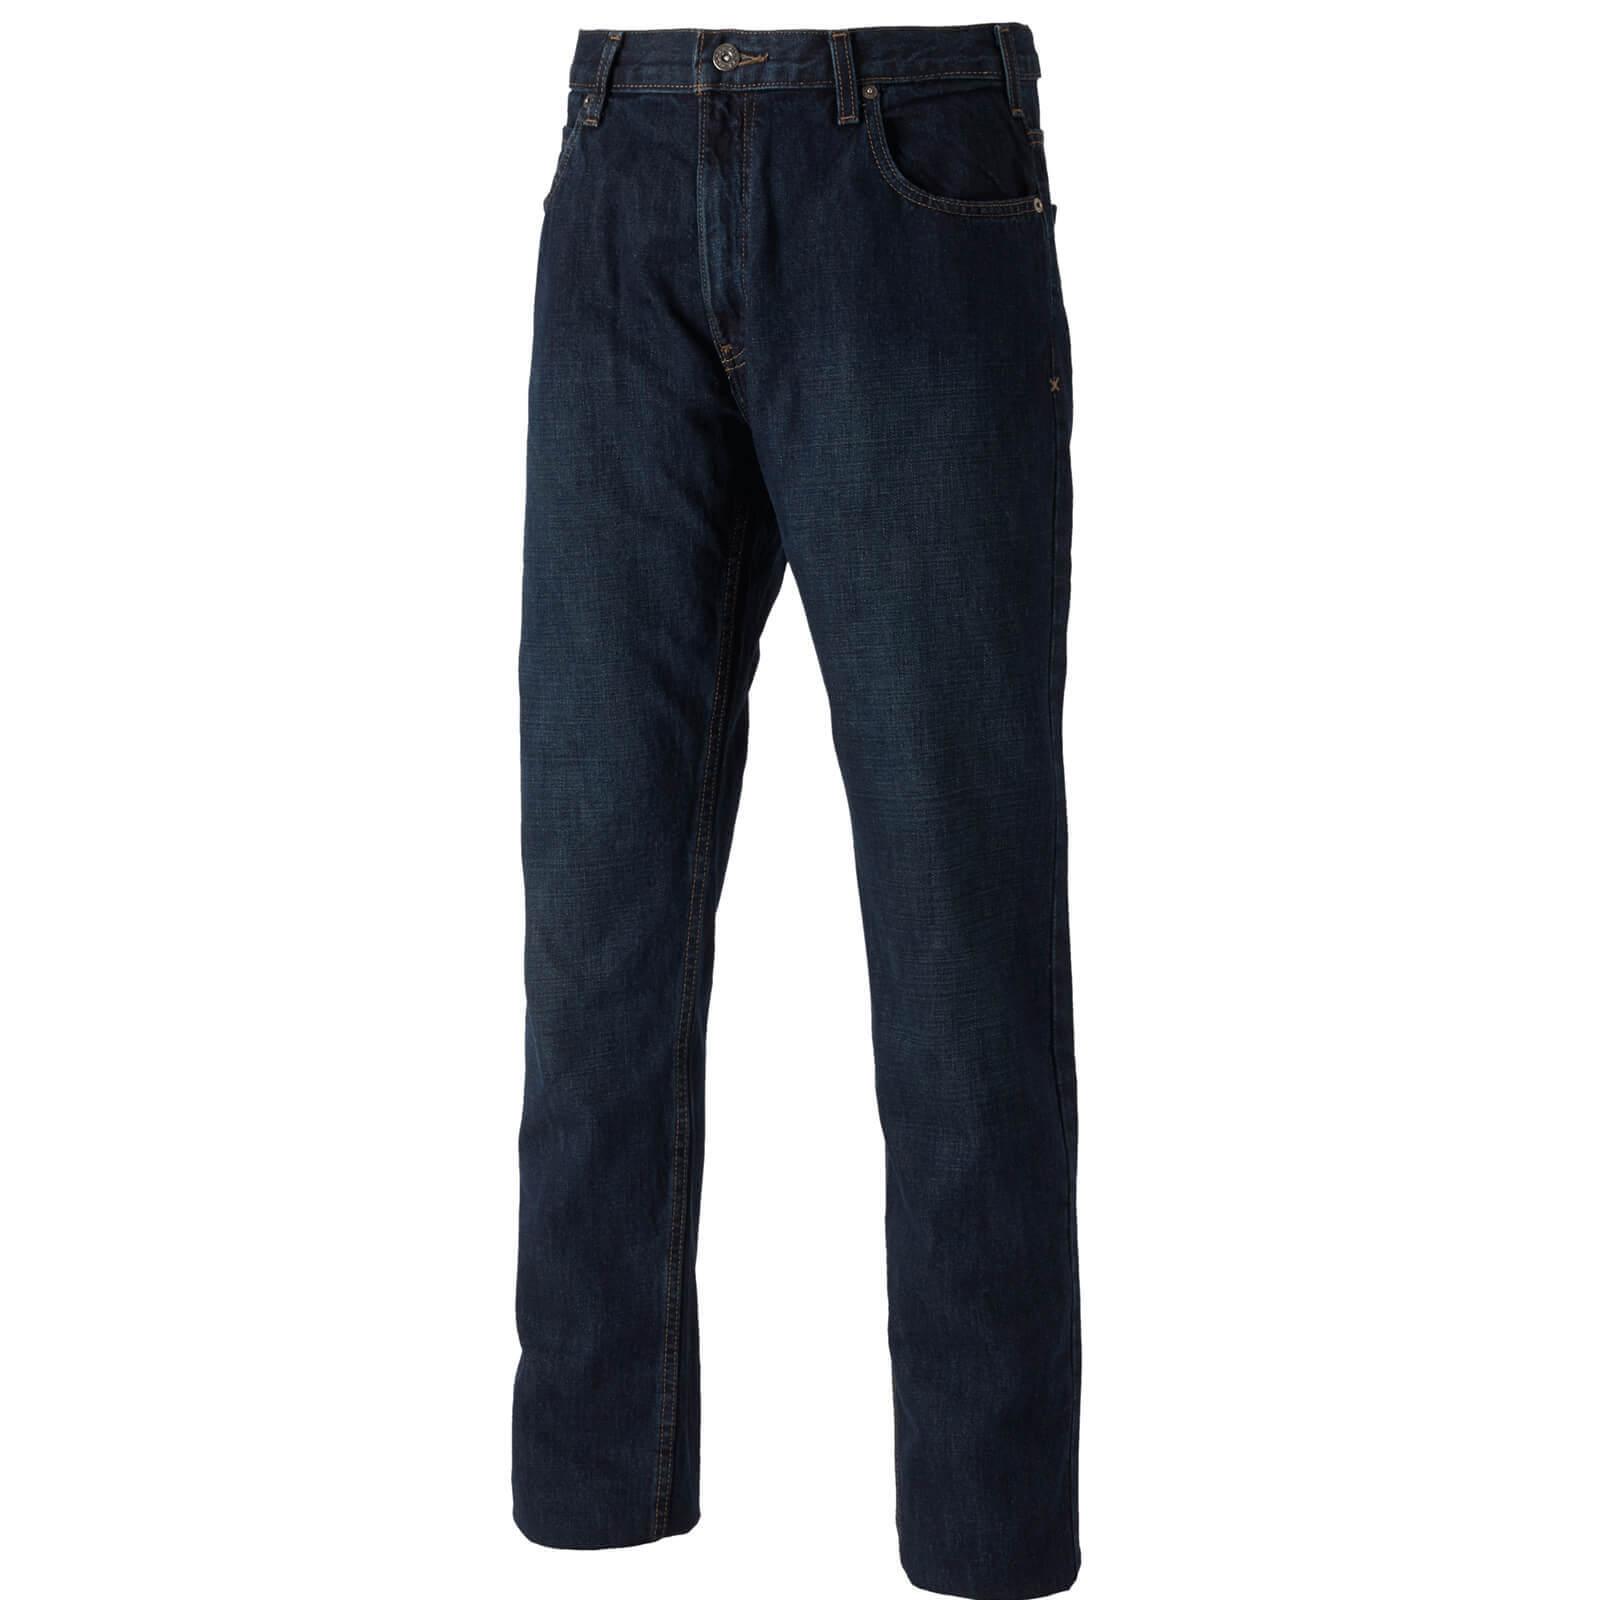 Dickies Mens X Series Jeans Tint Indigo 40